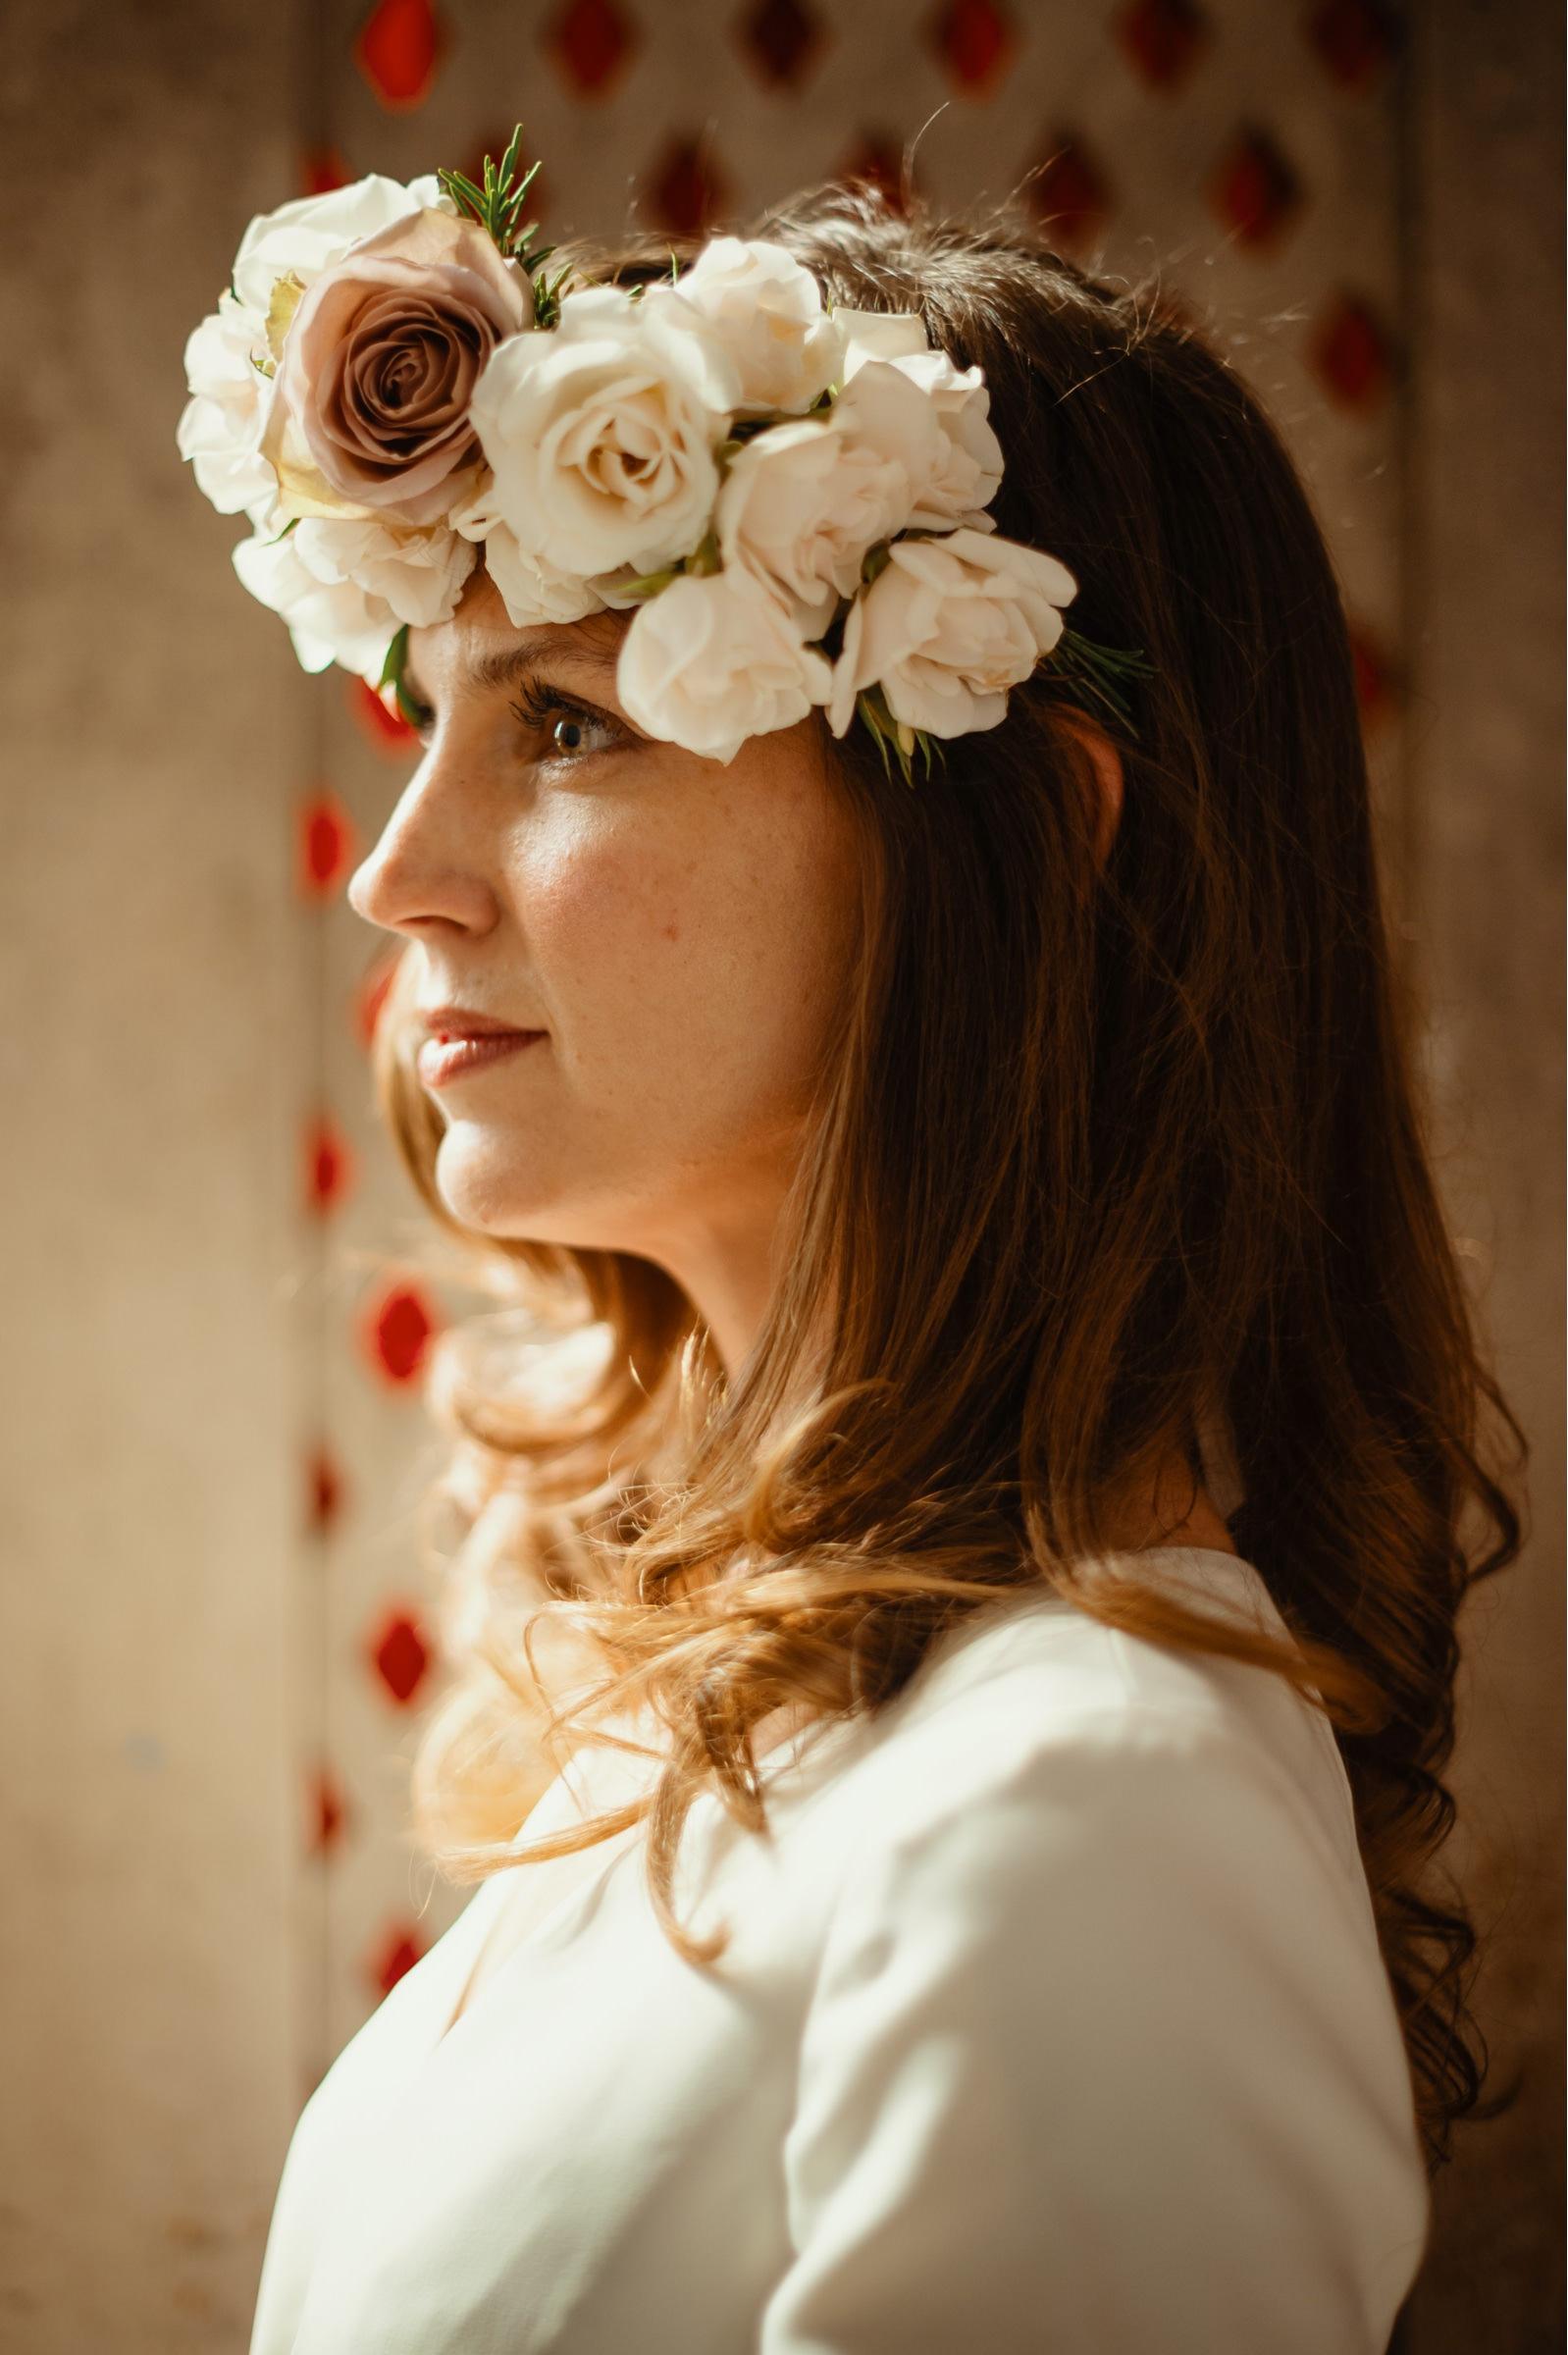 bride with floral hair piece portrait-new orleans-austin-houston - photo by Dark Roux